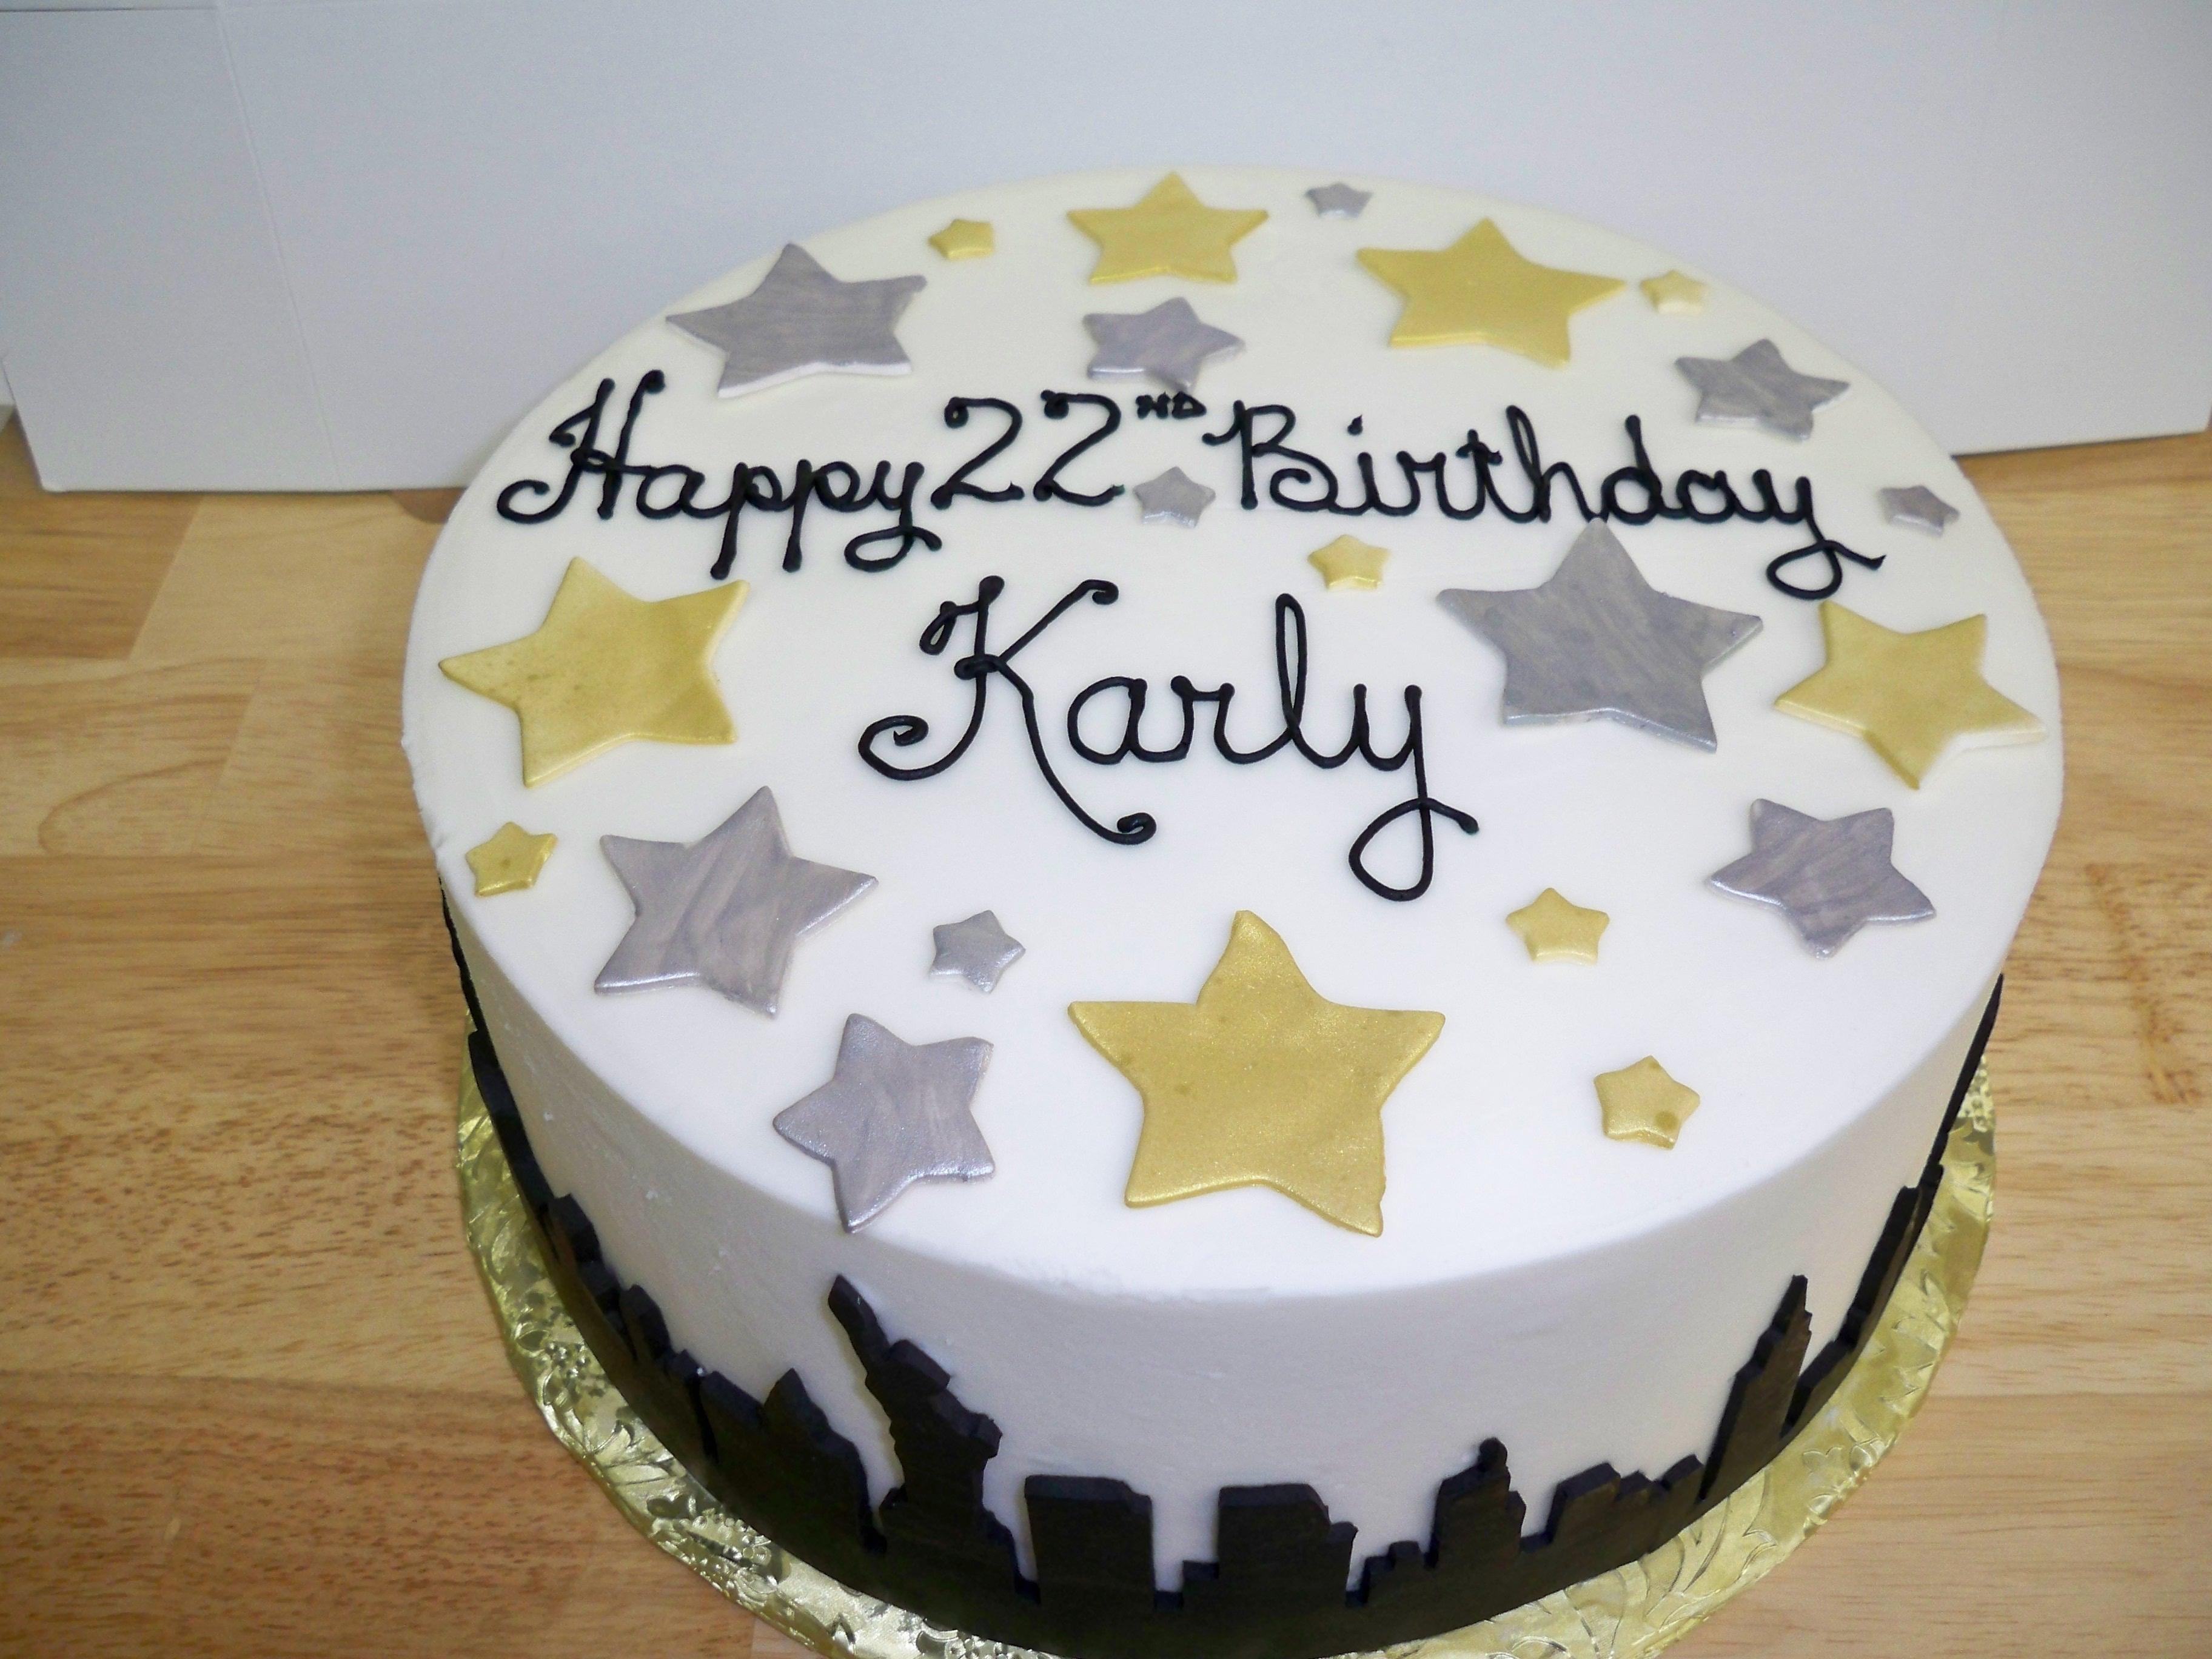 birthday cake, cake with stars, silhouette cake